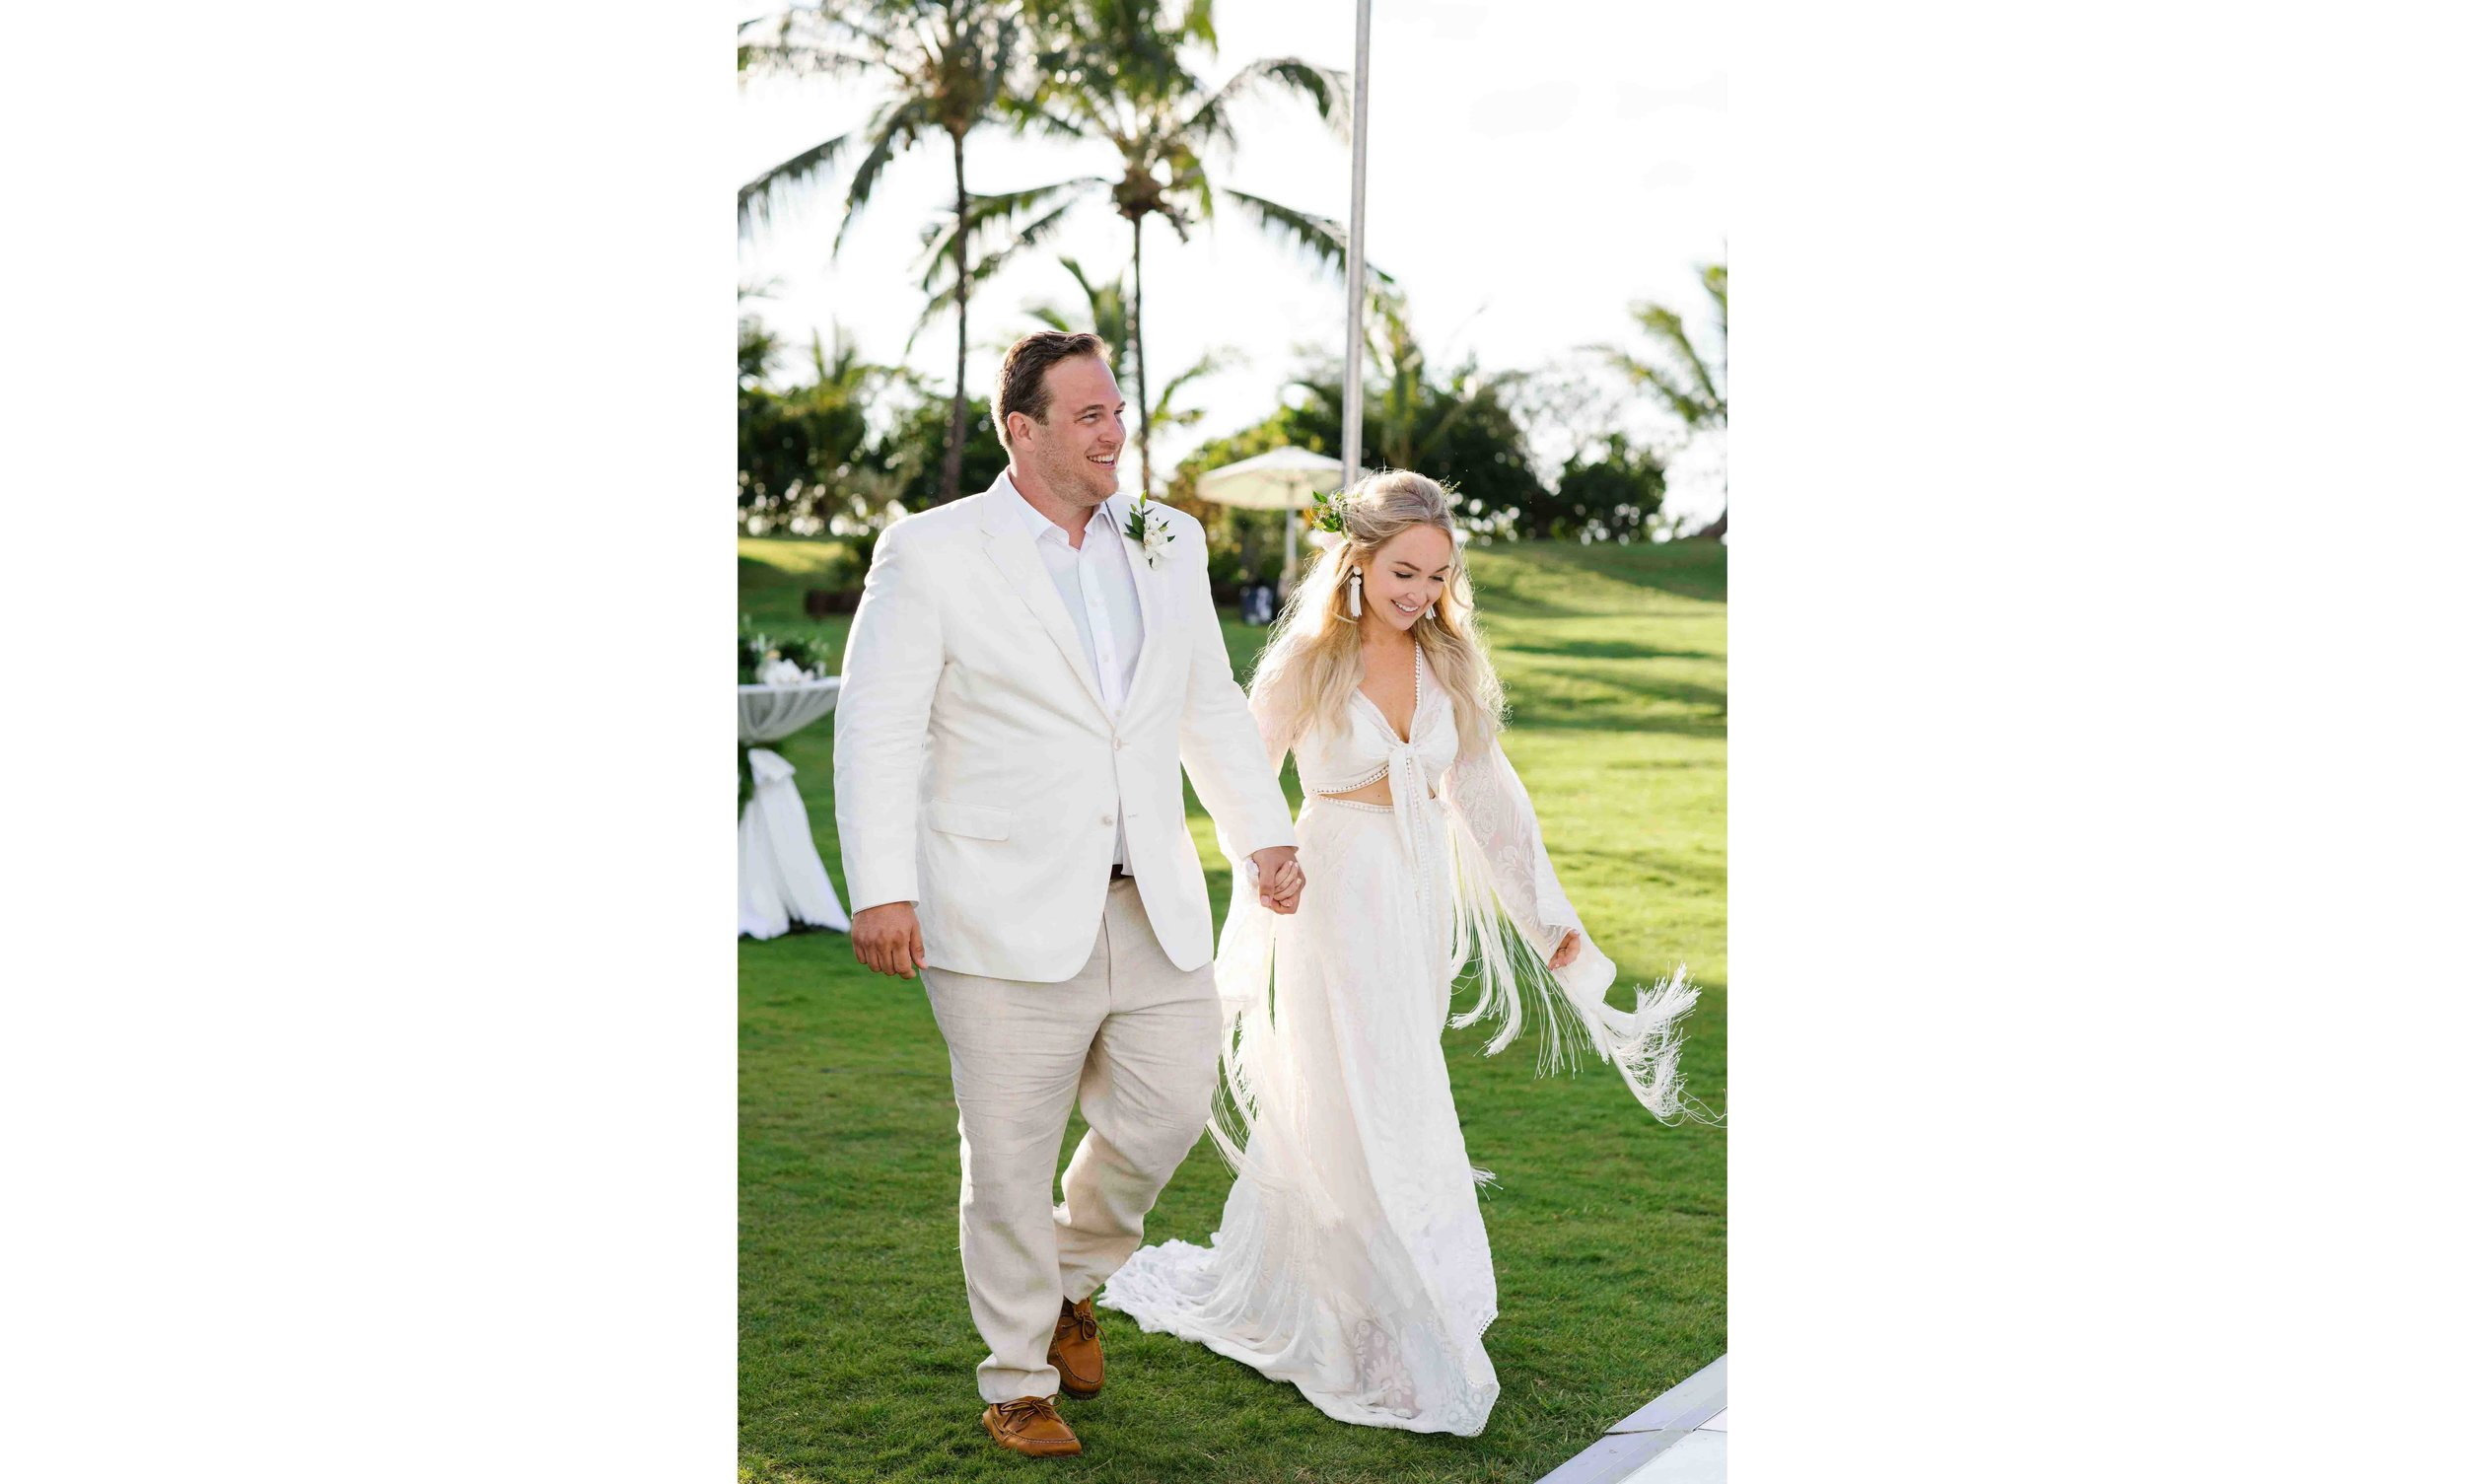 Candid Wedding Photography of Boho Bride and Groom